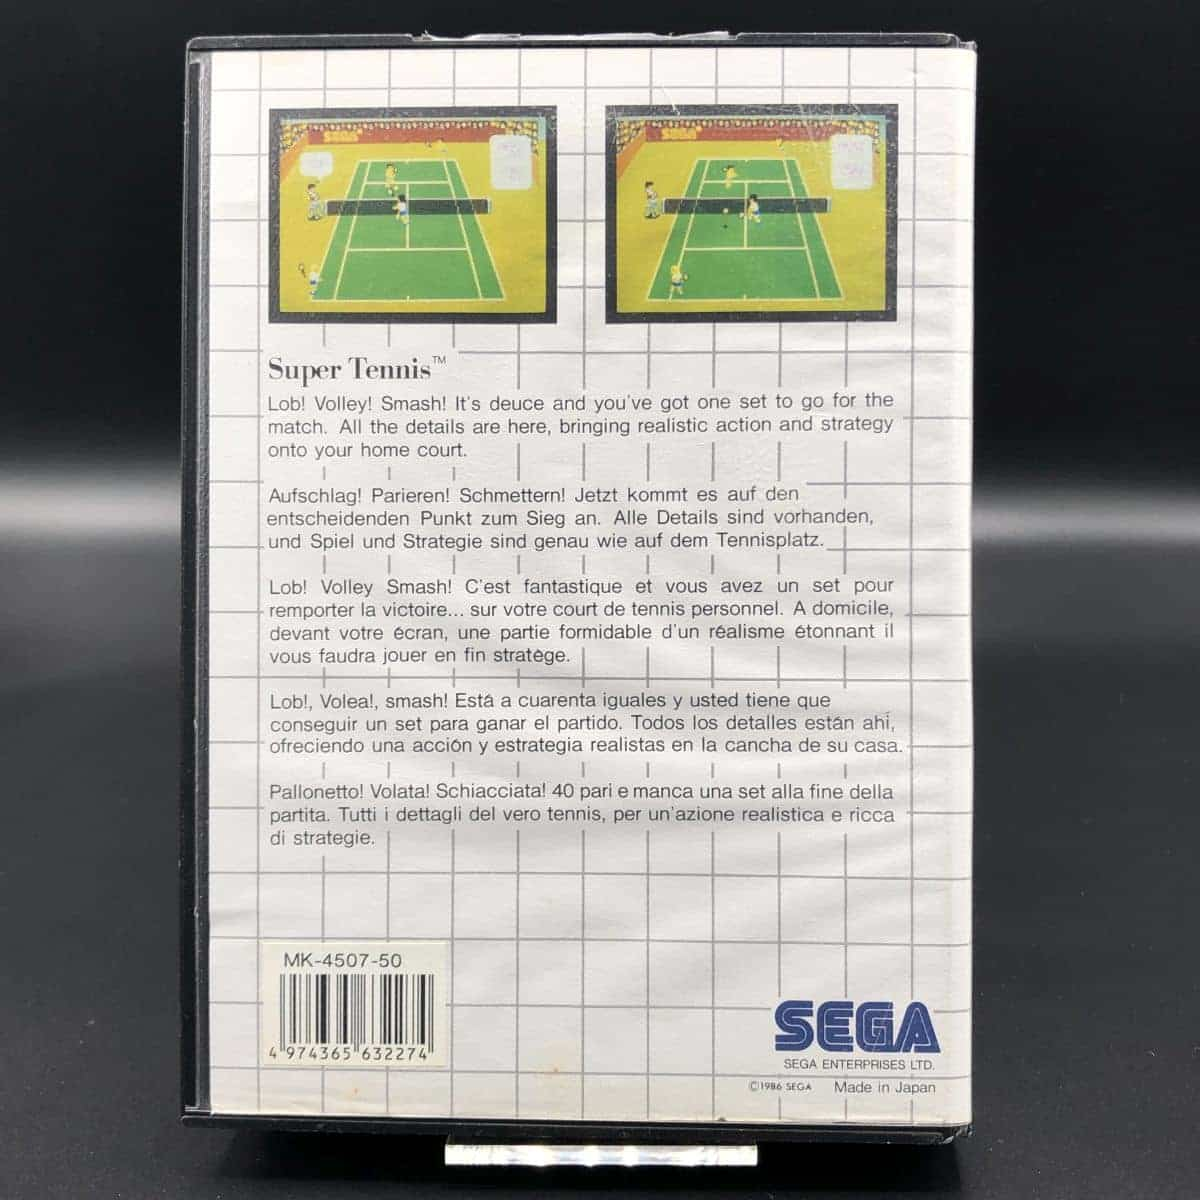 Super Tennis (Komplett) (Gebrauchsspuren) Sega Master System